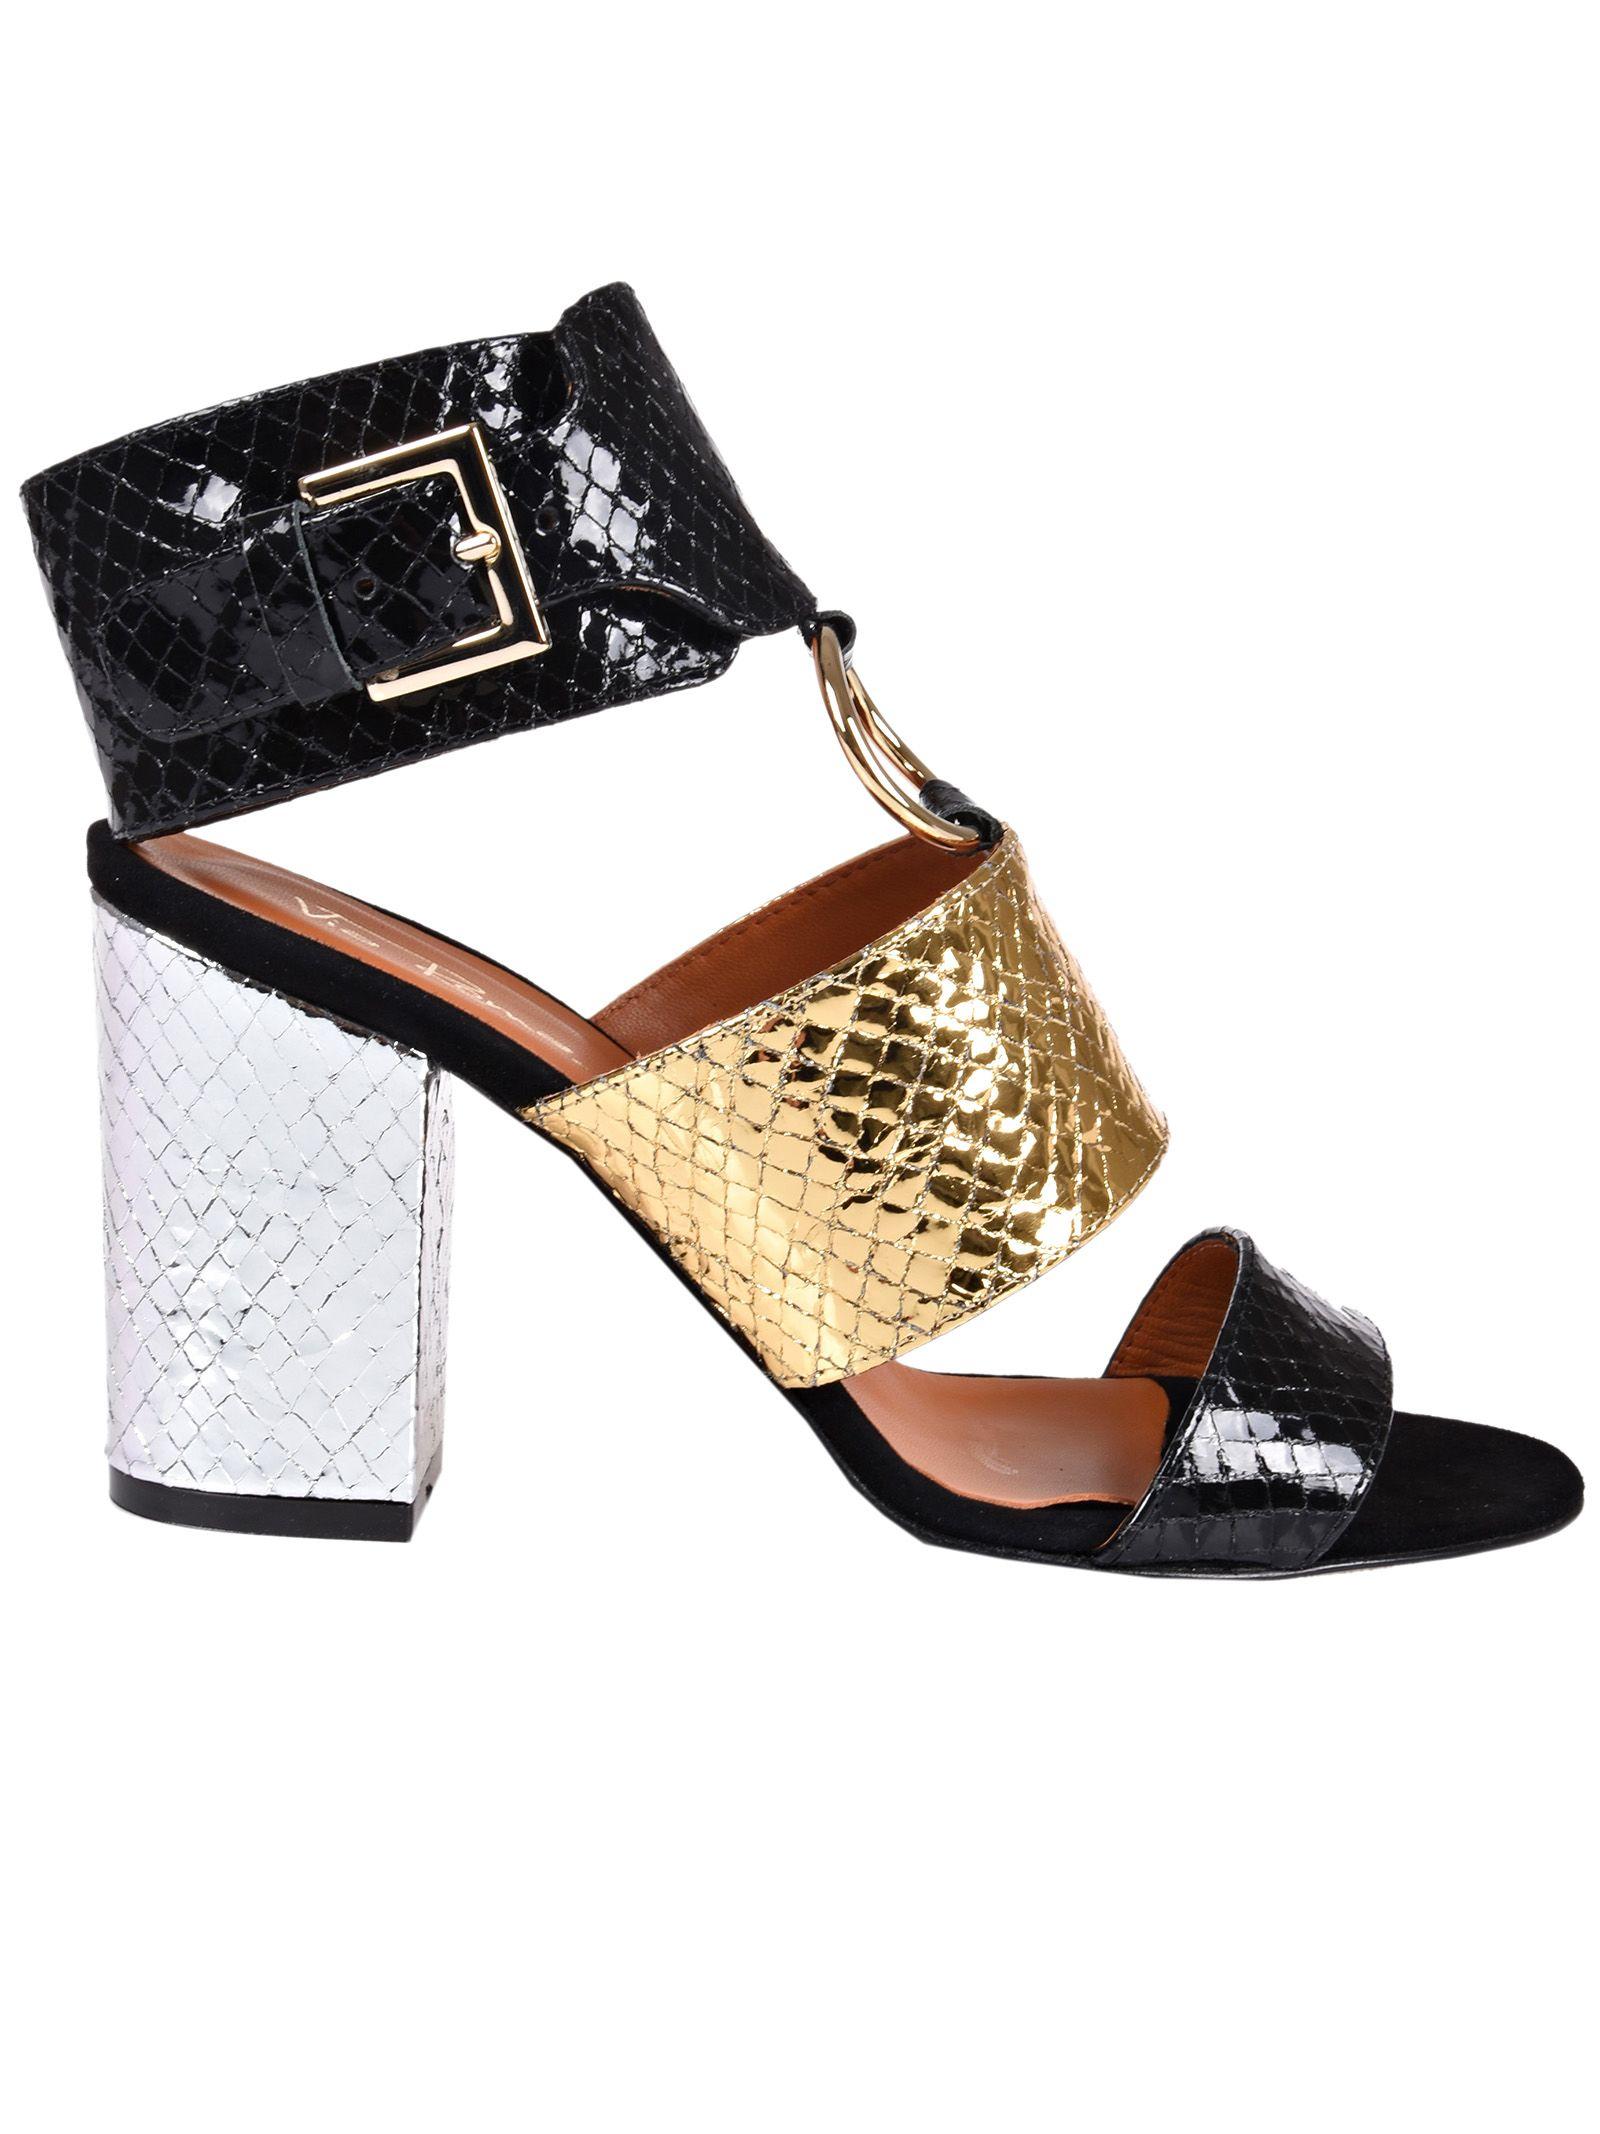 snakeskin-effect ring detail sandals - Black Via Roma 15 Cheap Sale Cheapest Free Shipping Pre Order TK9wEmZ